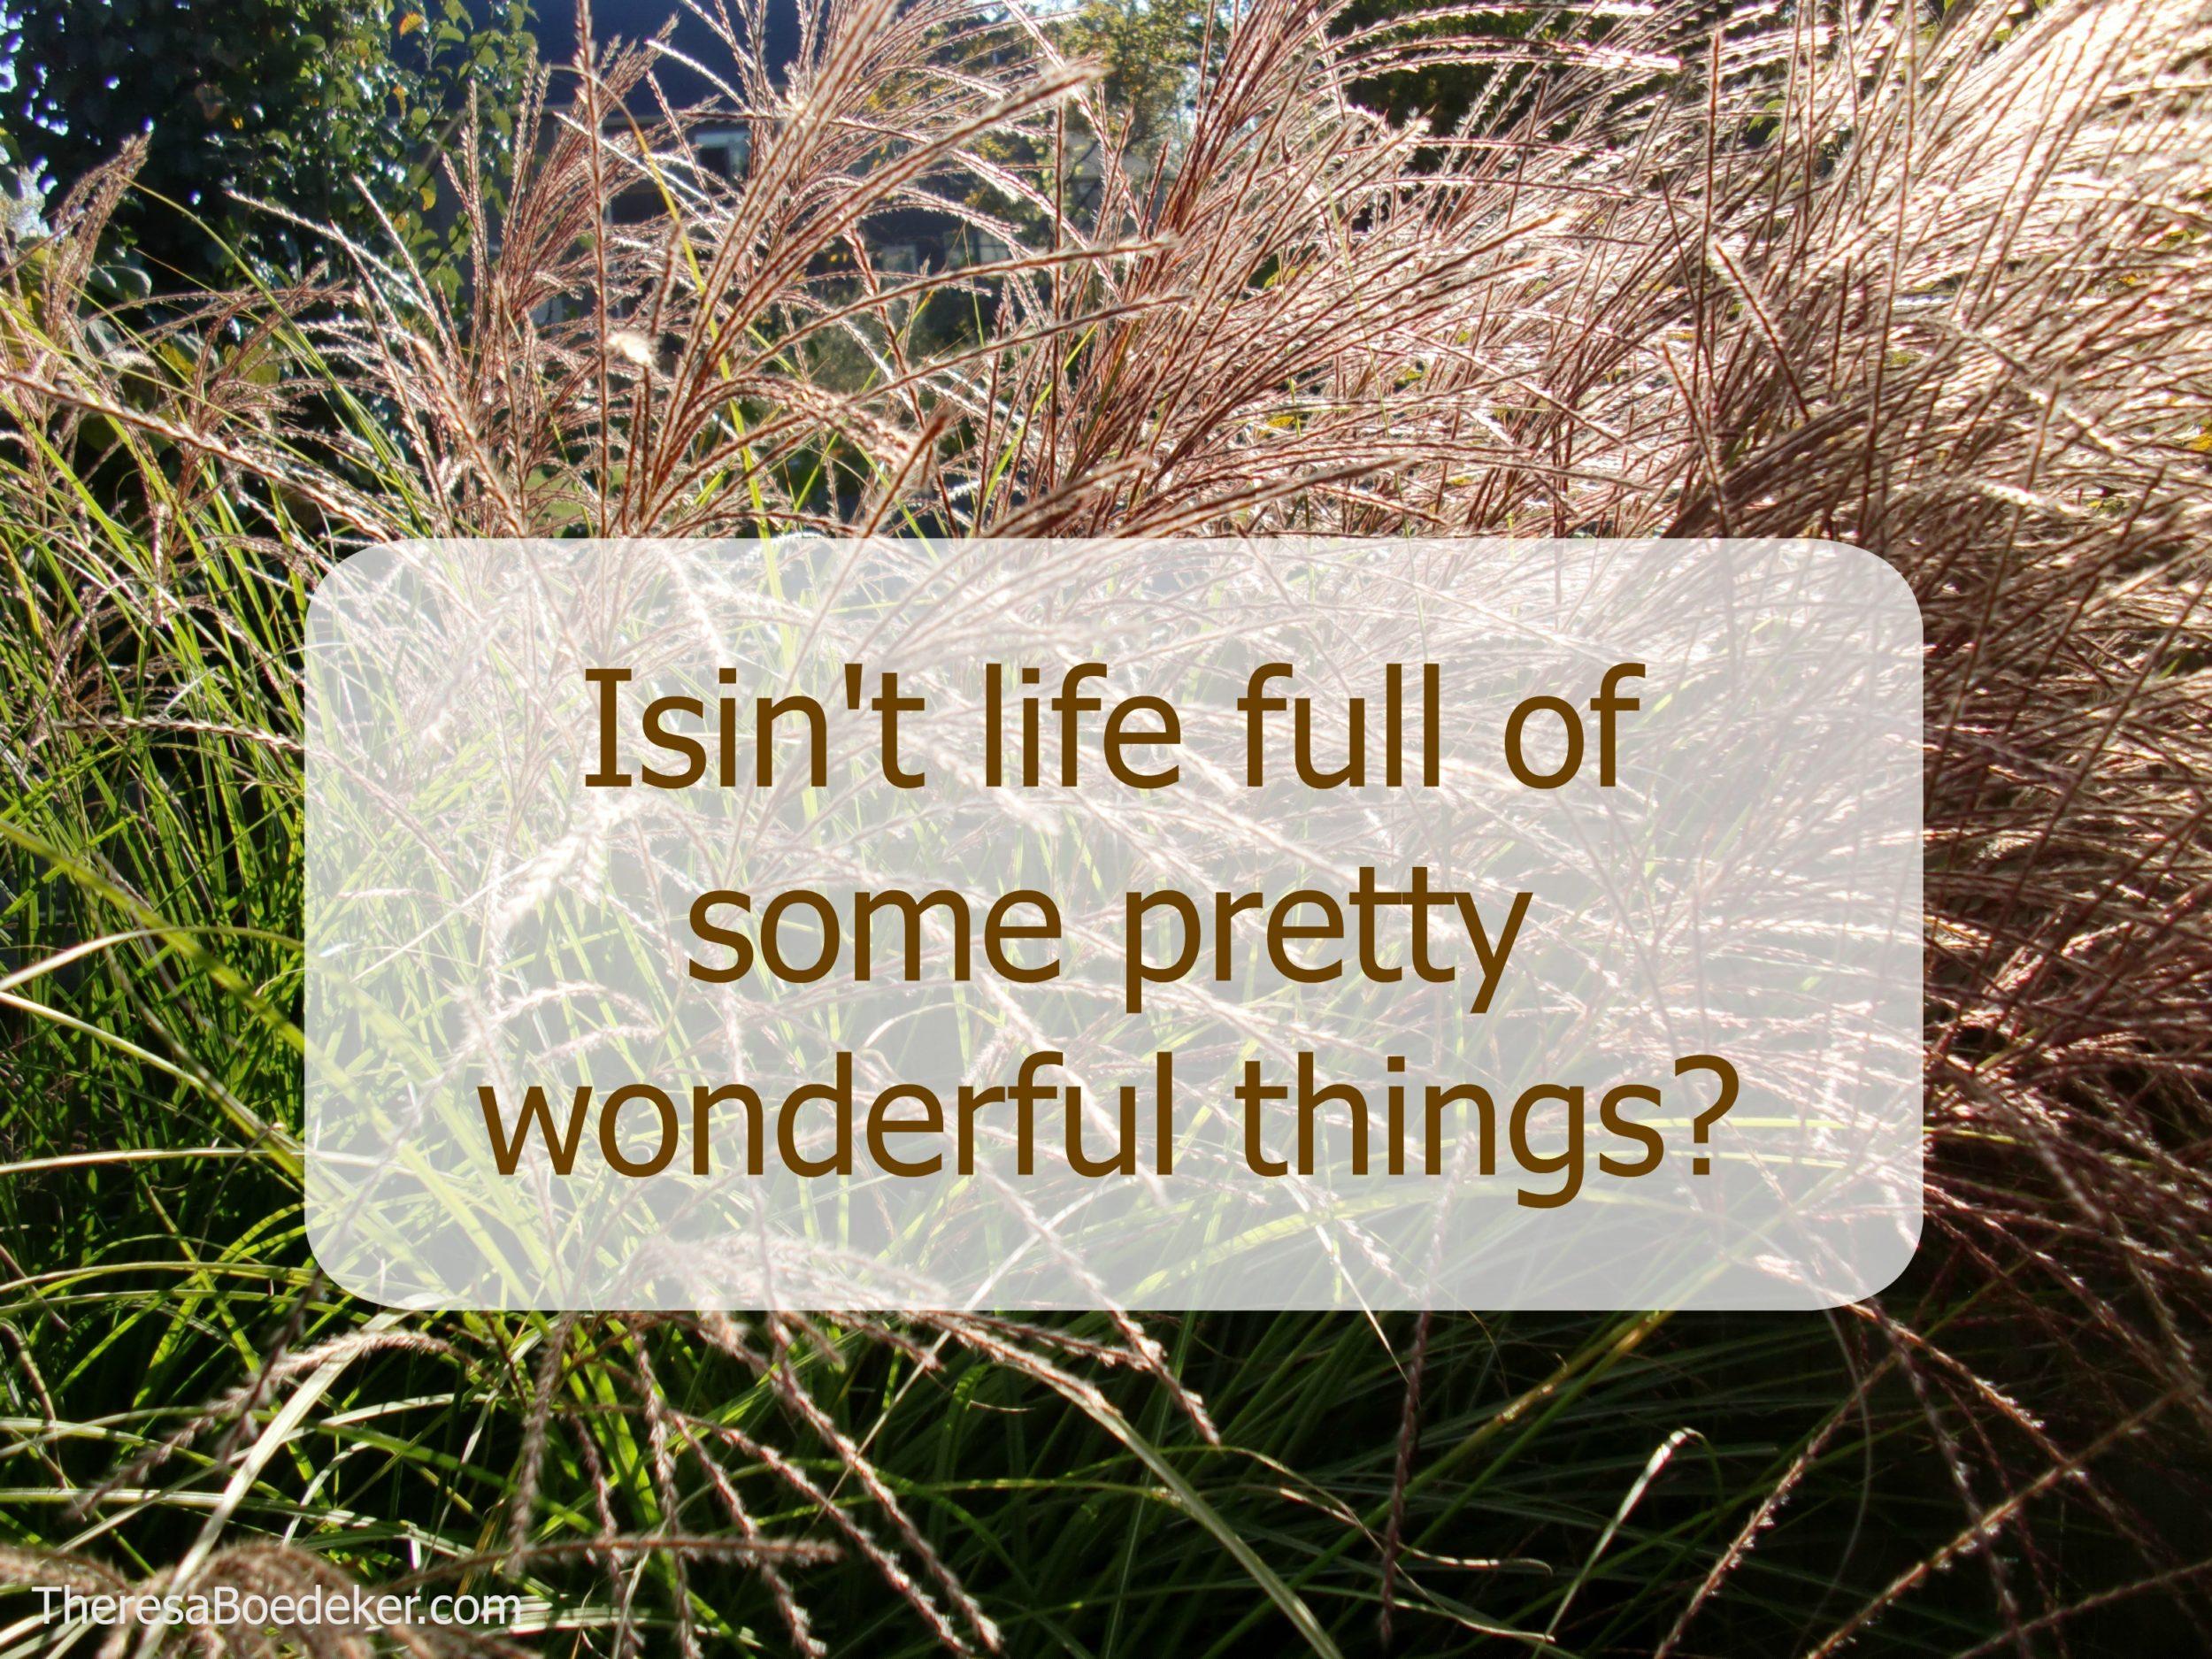 isint-if-wonderful-quote